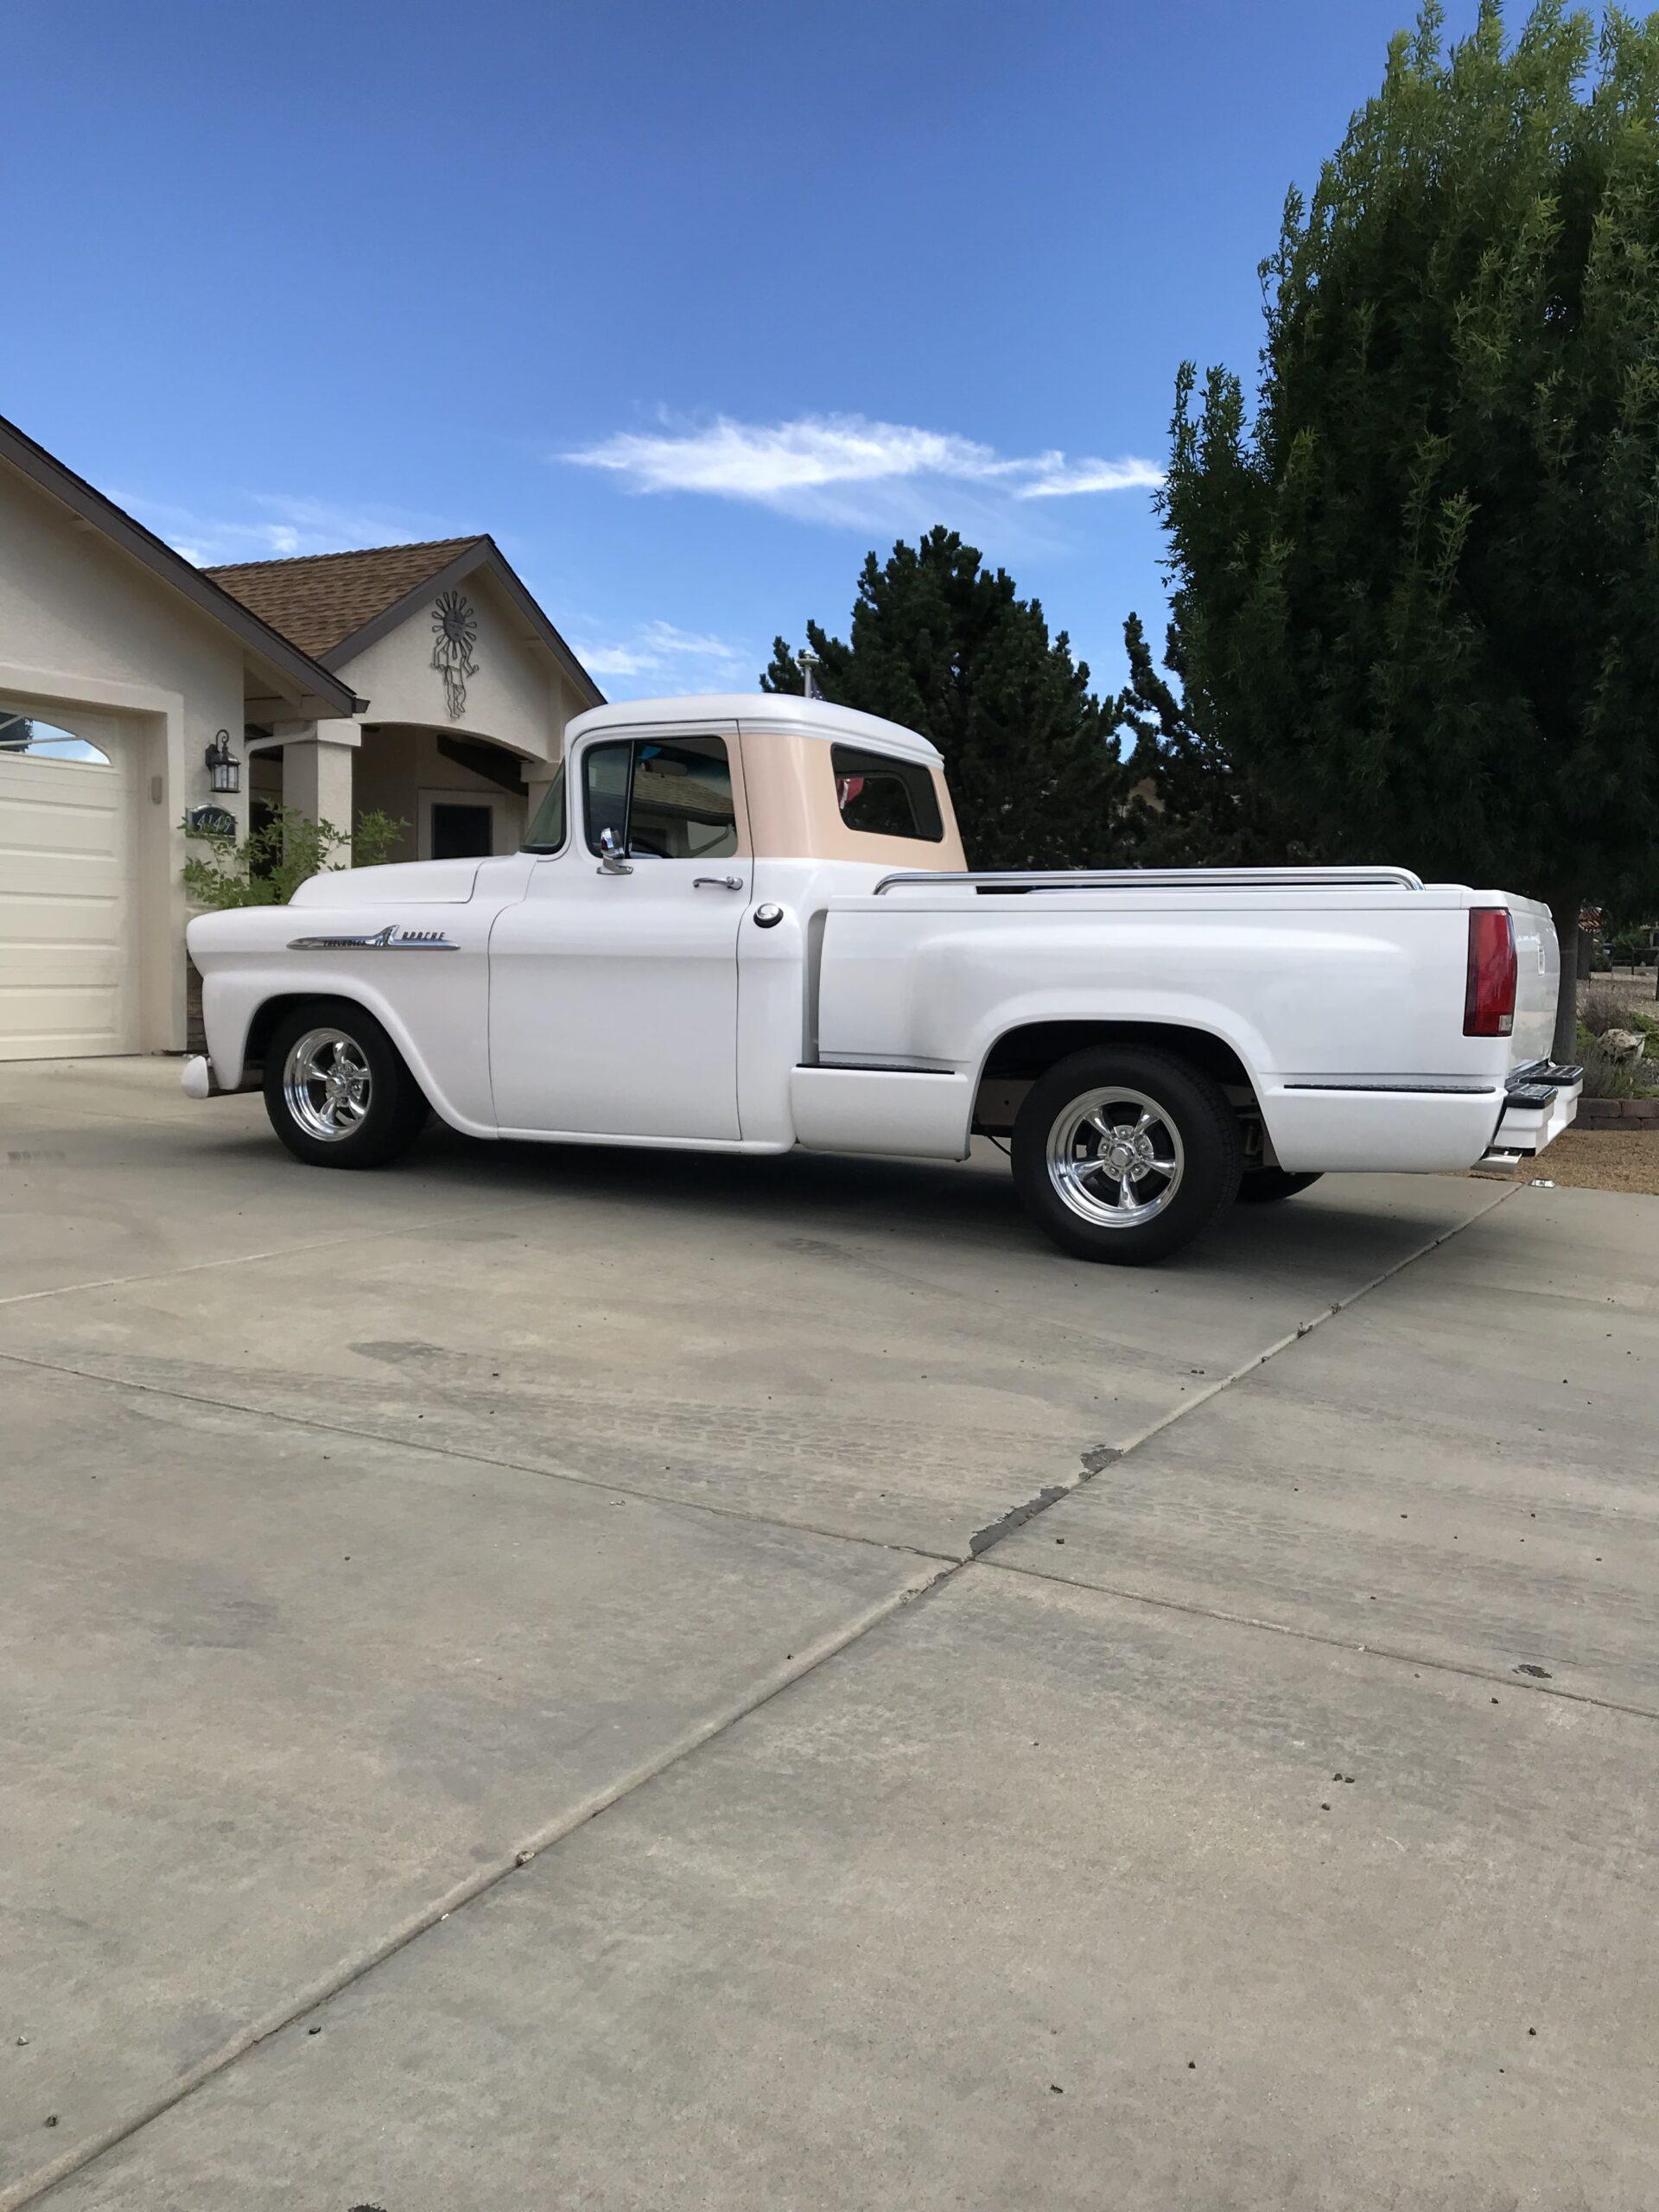 James Alexander - Prescott Valley, AZ - 1958 Chevrolet Apache